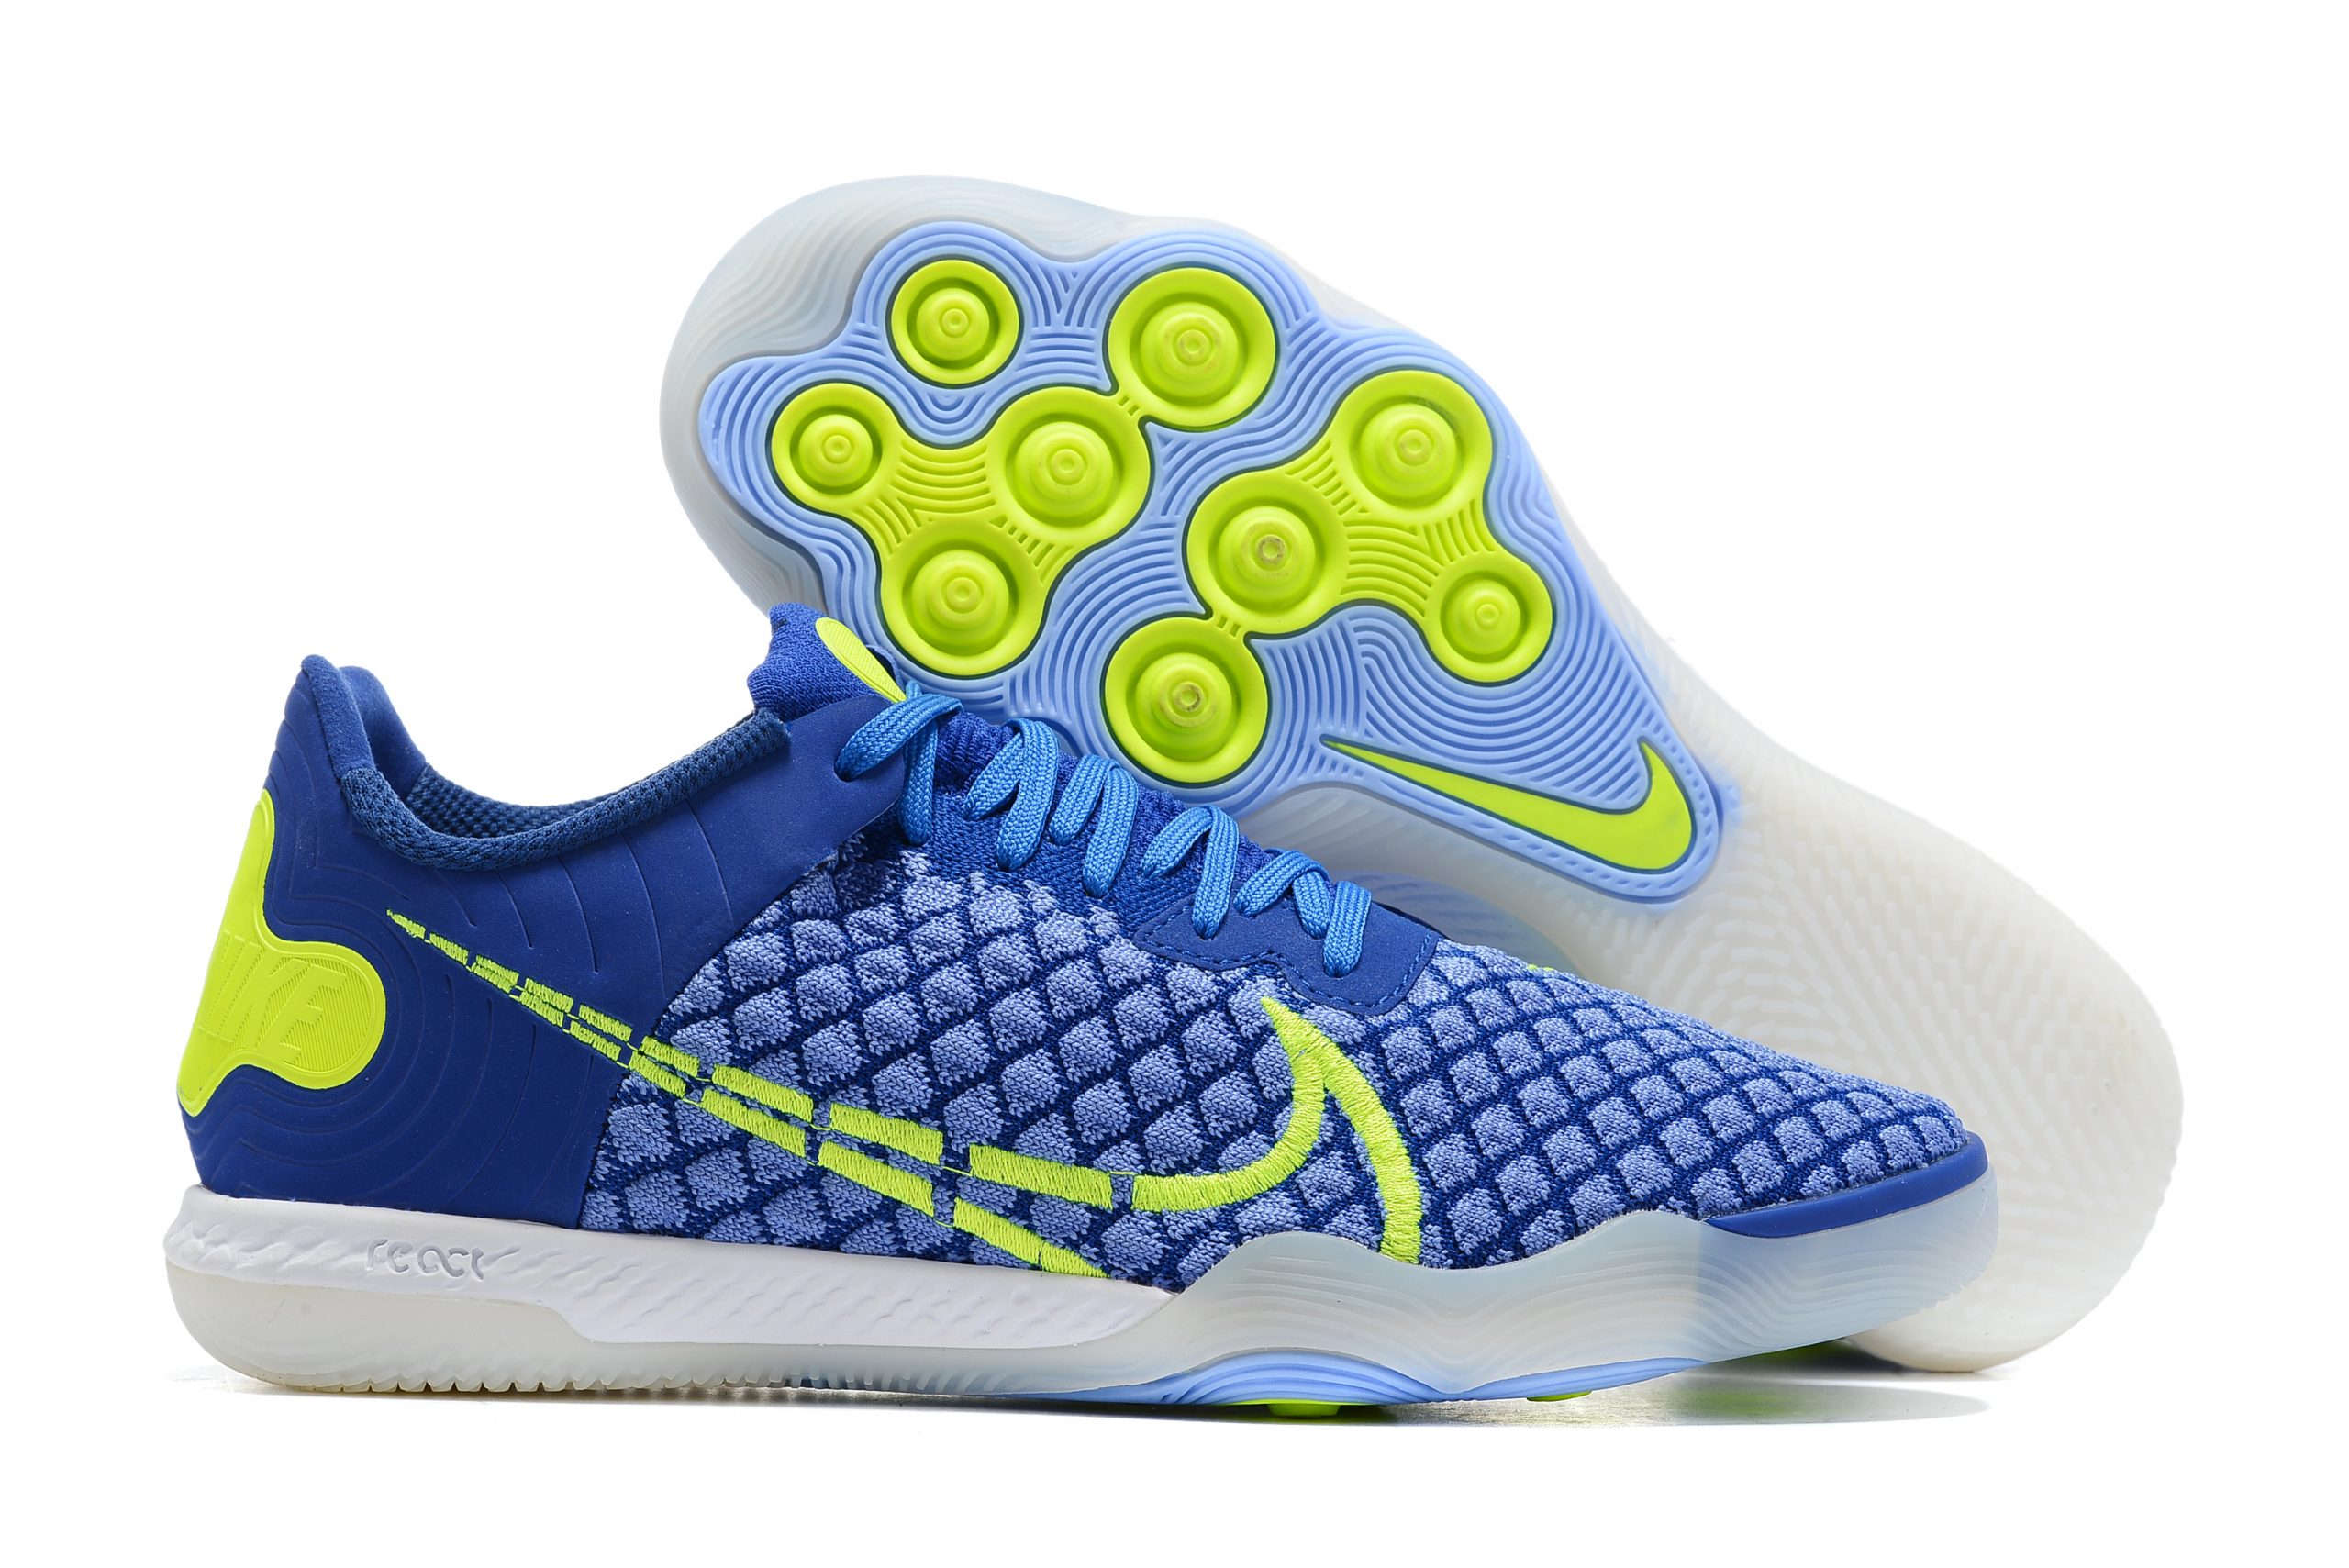 Nike Reactgato IC blue and yellow football boots Outside